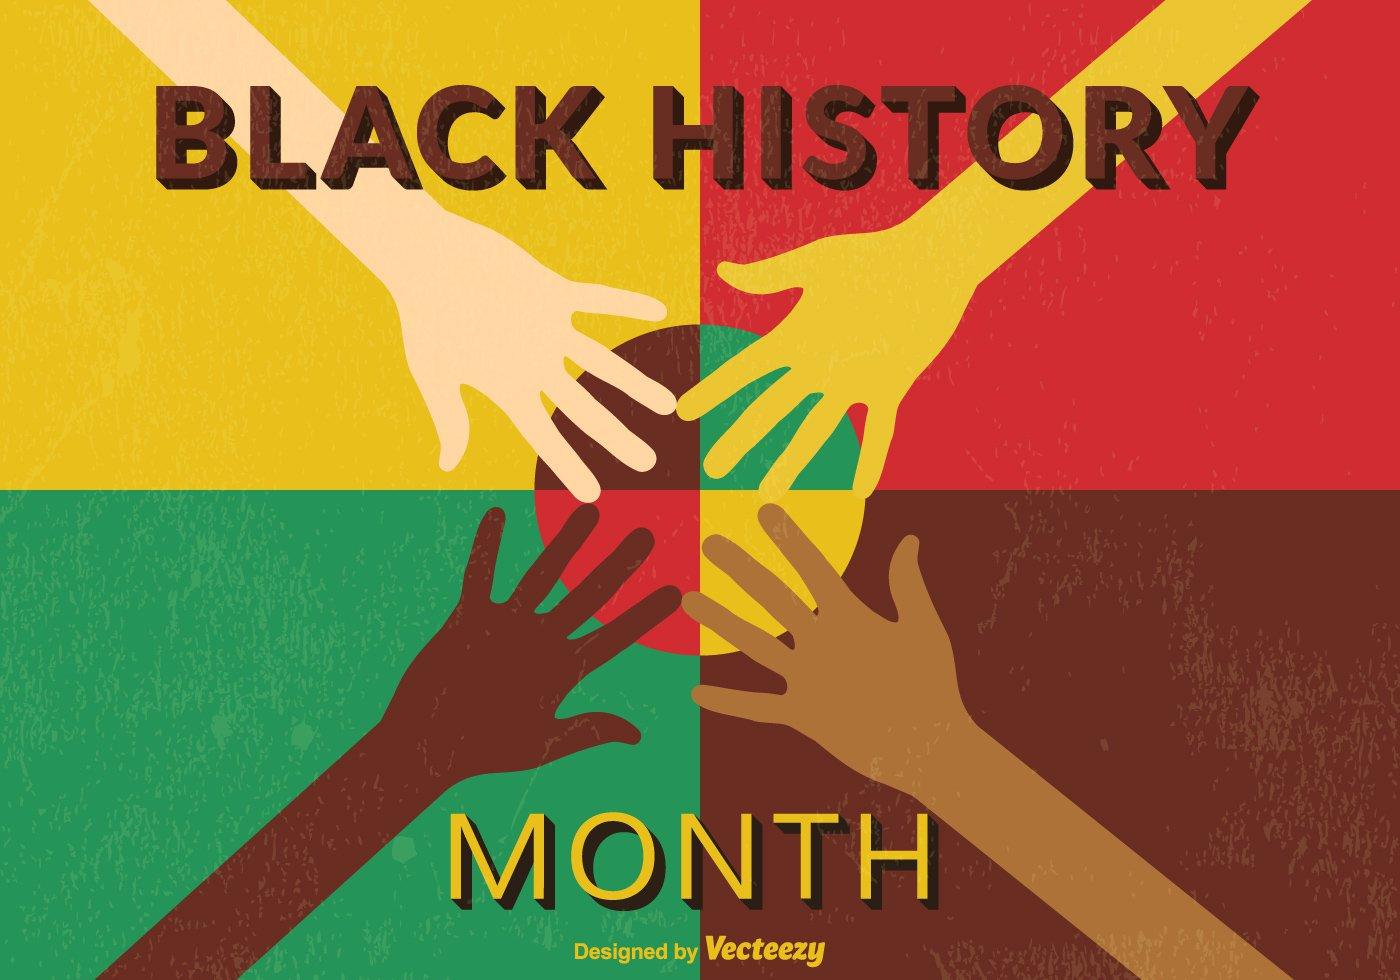 Retro Black Month History Psd Poster